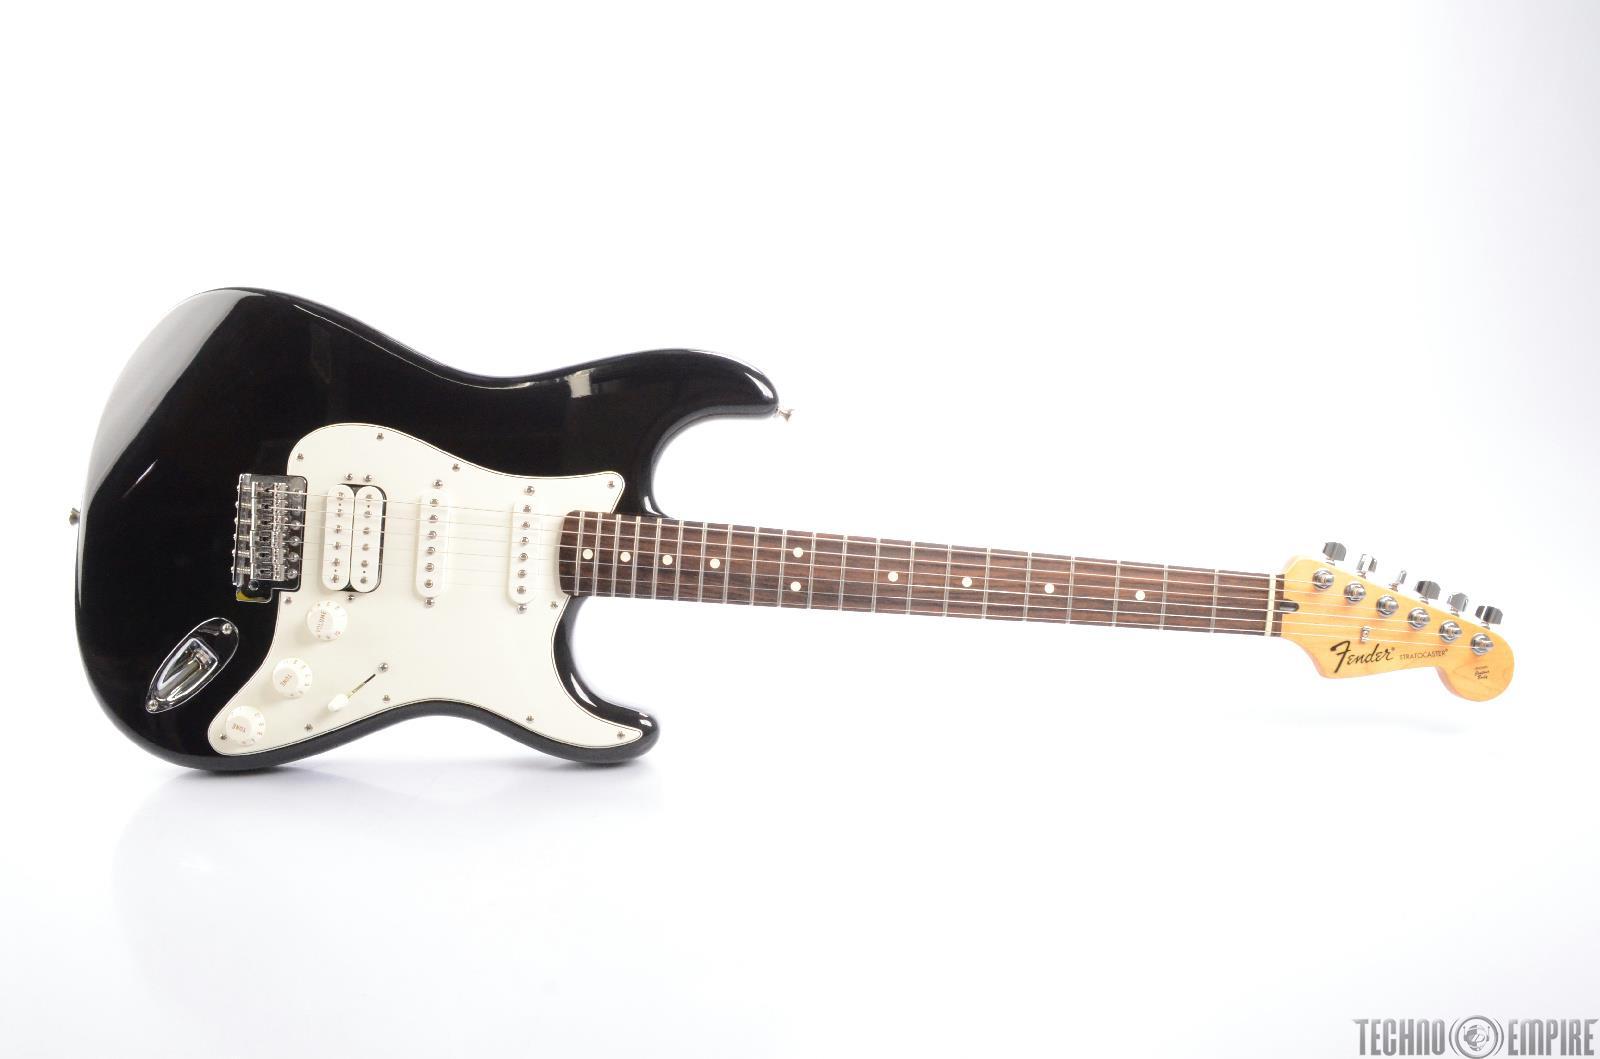 2009 FENDER Stratocaster Standard HSS Black Strat Electric Guitar MIM #24766